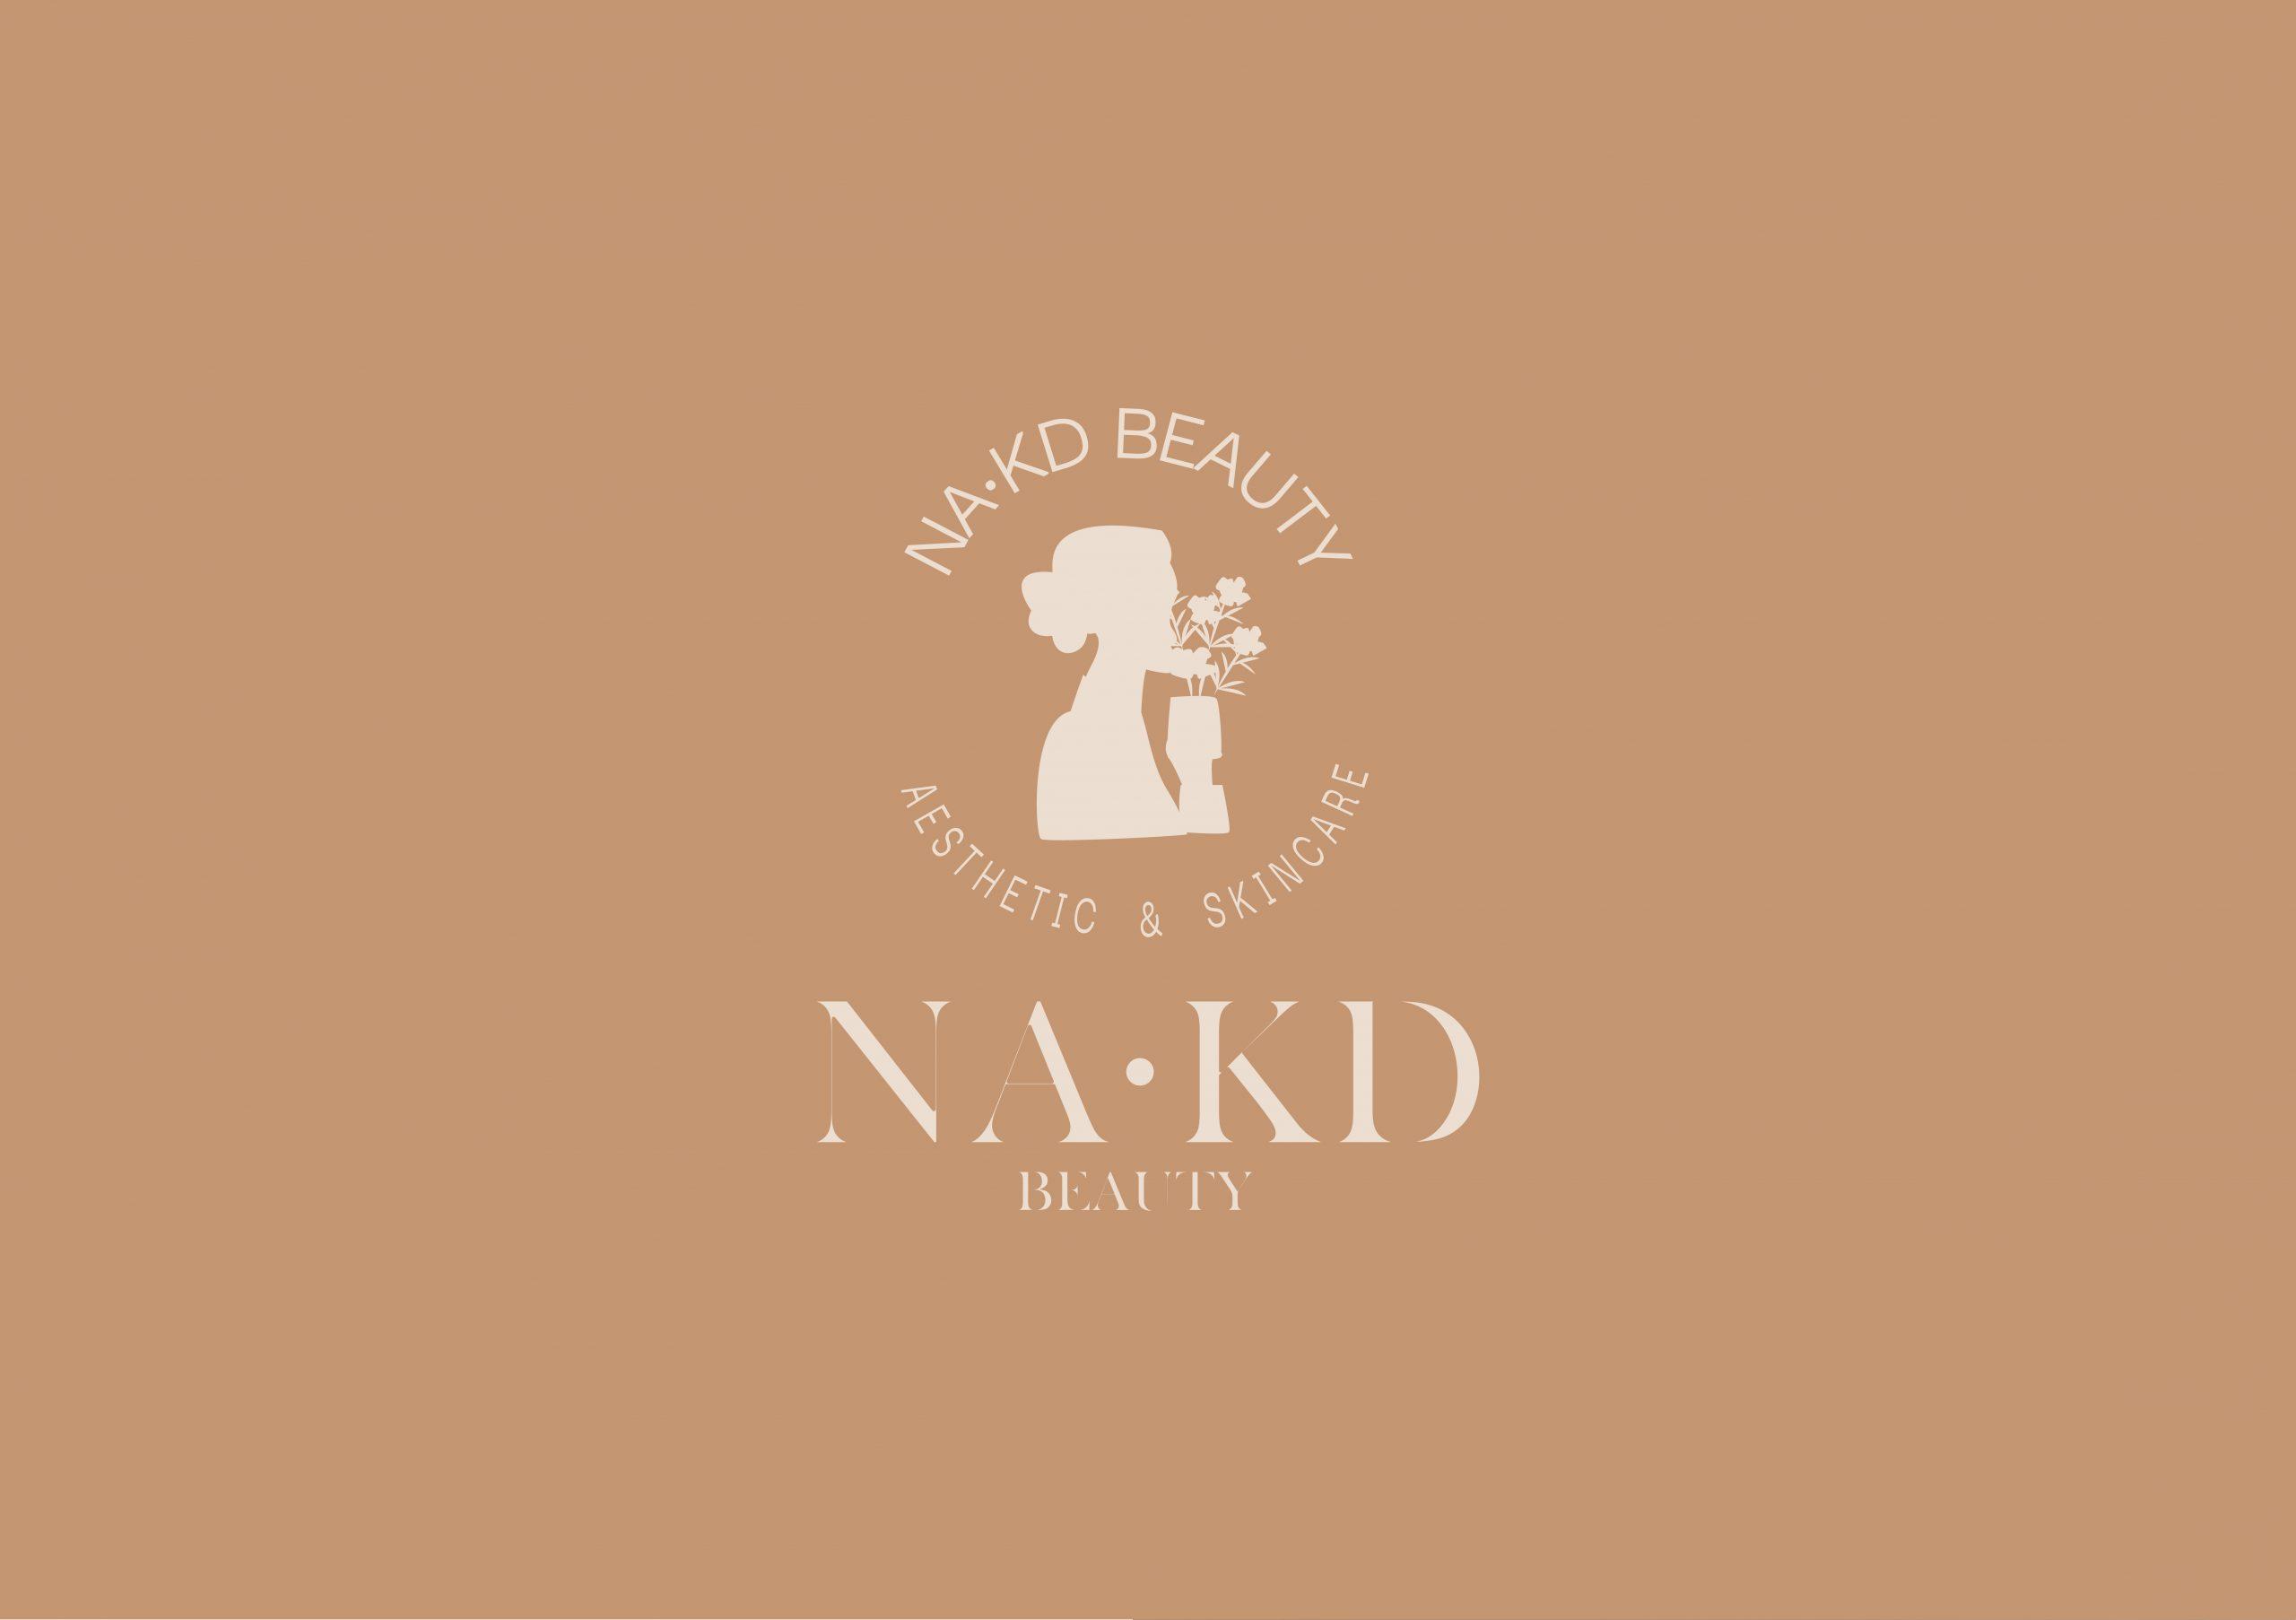 Nakd beauty purpose 03 scaled